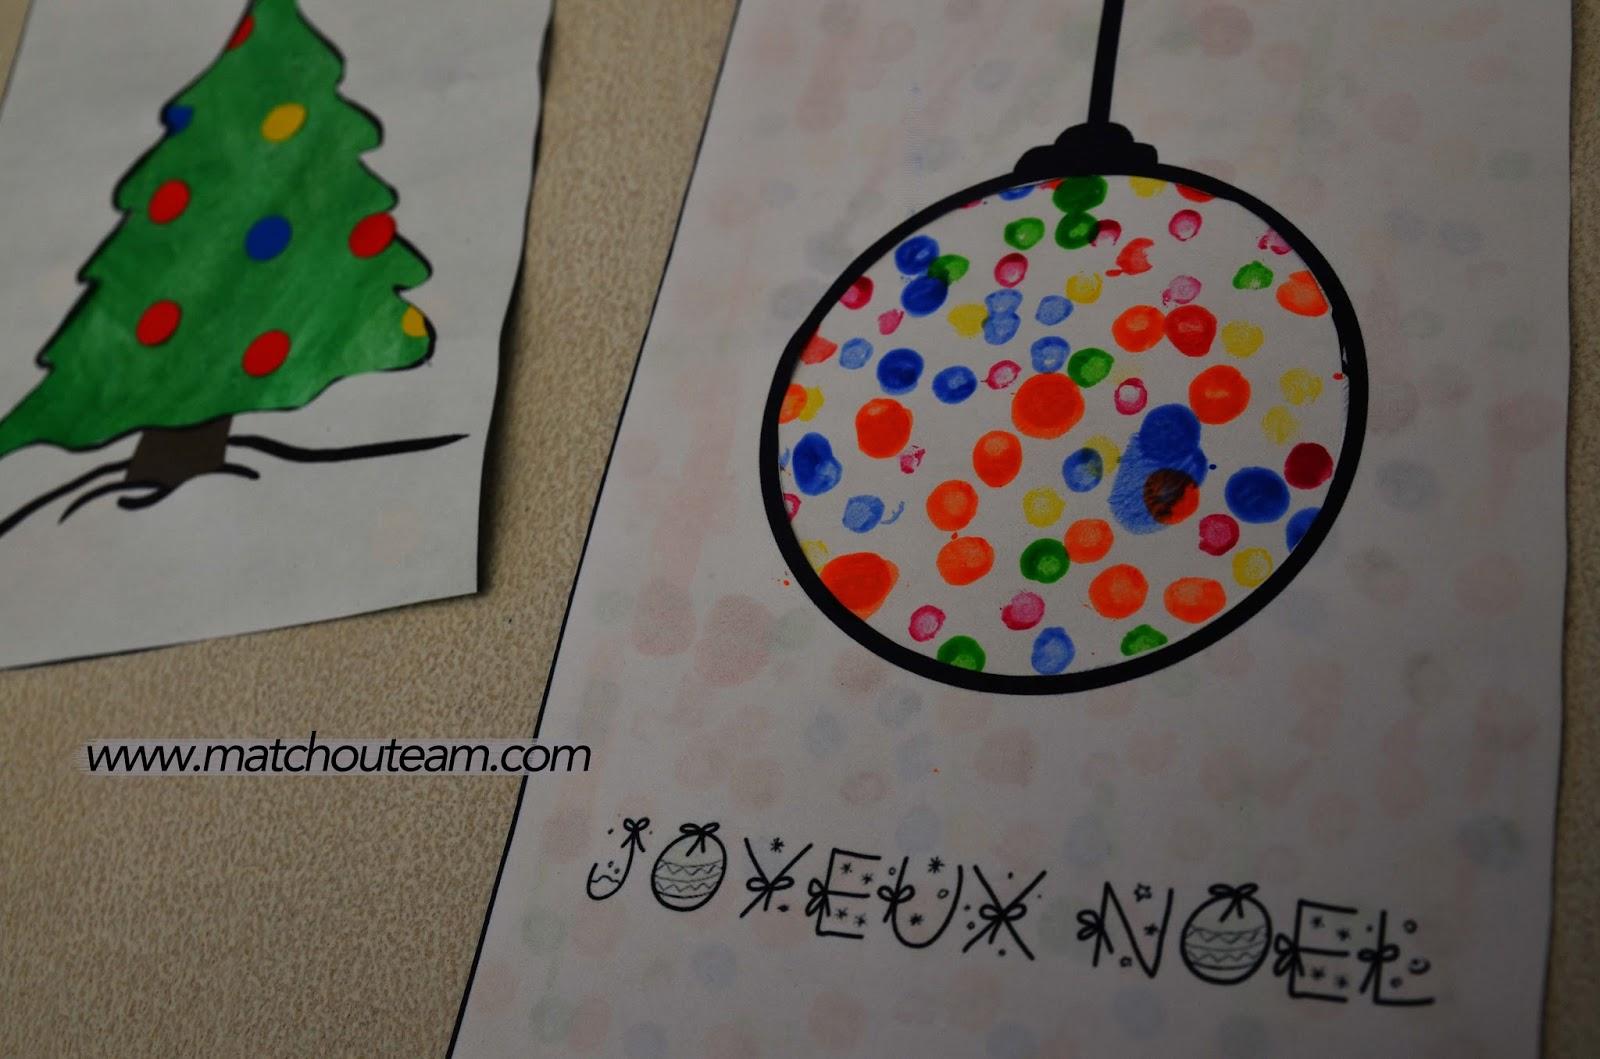 Fabuleux Ma Tchou team: Carte Joyeux Noël EL64